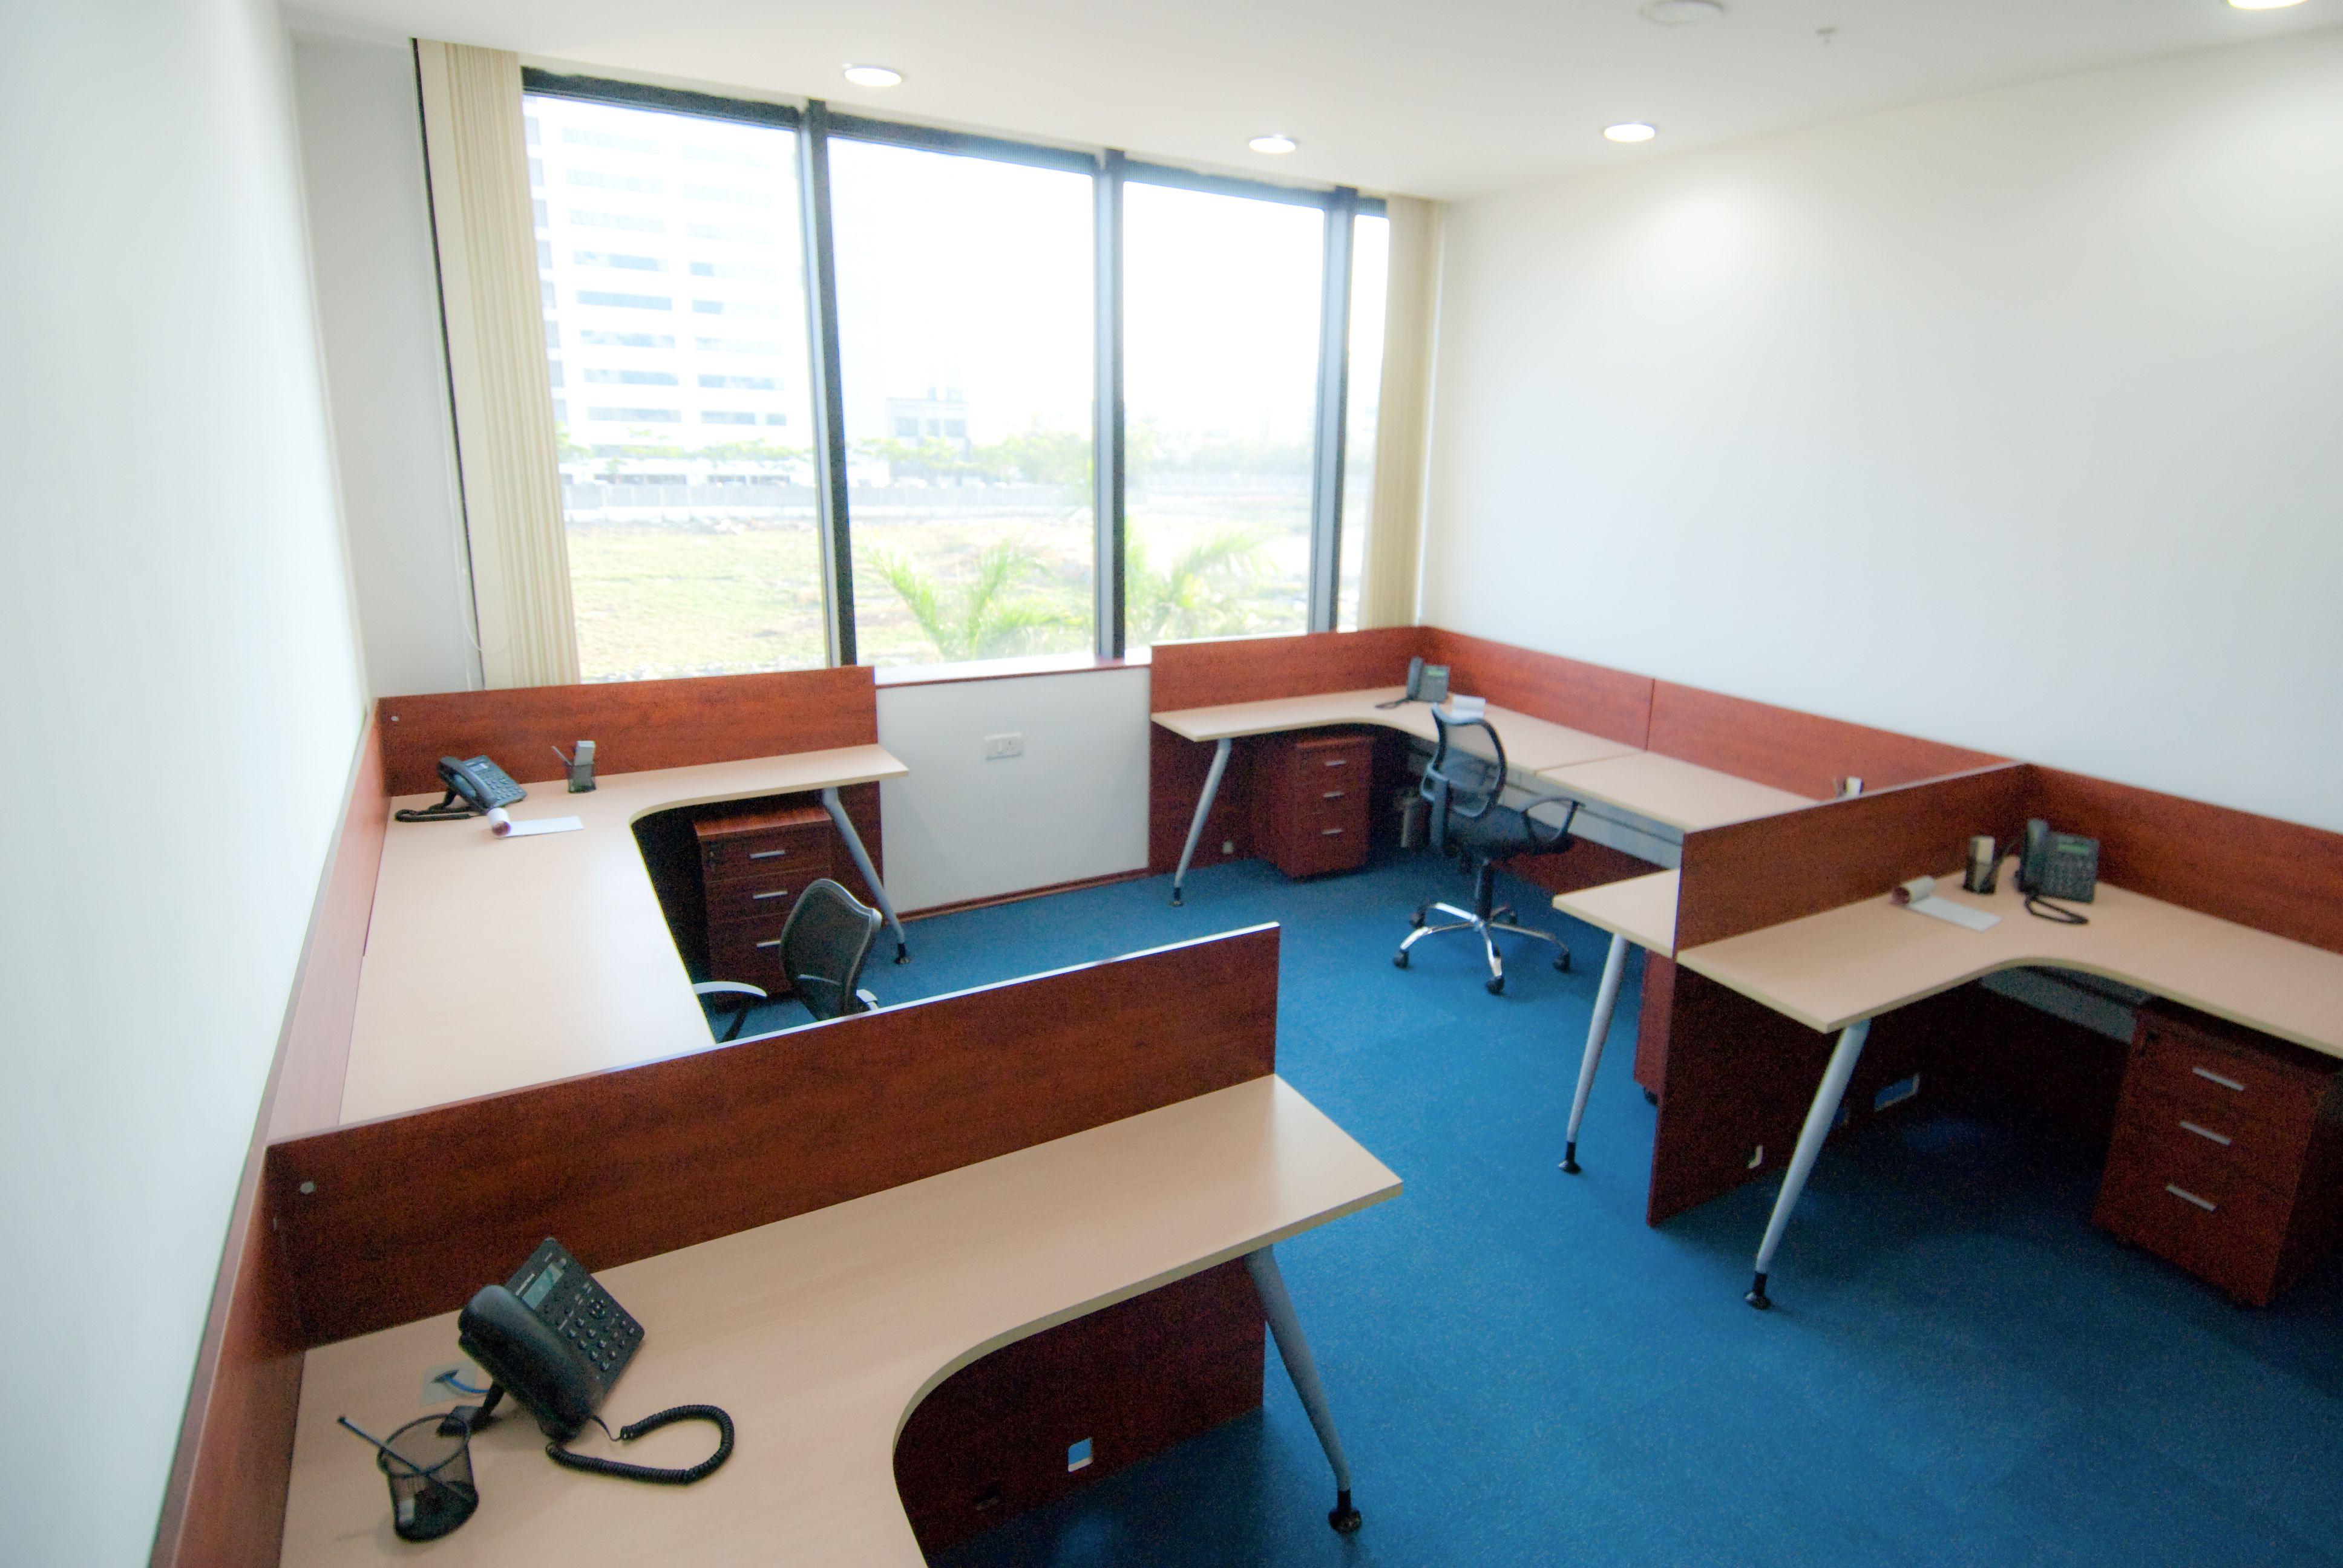 Office Room For Rent Kuala Lumpur | Office room | Pinterest ...